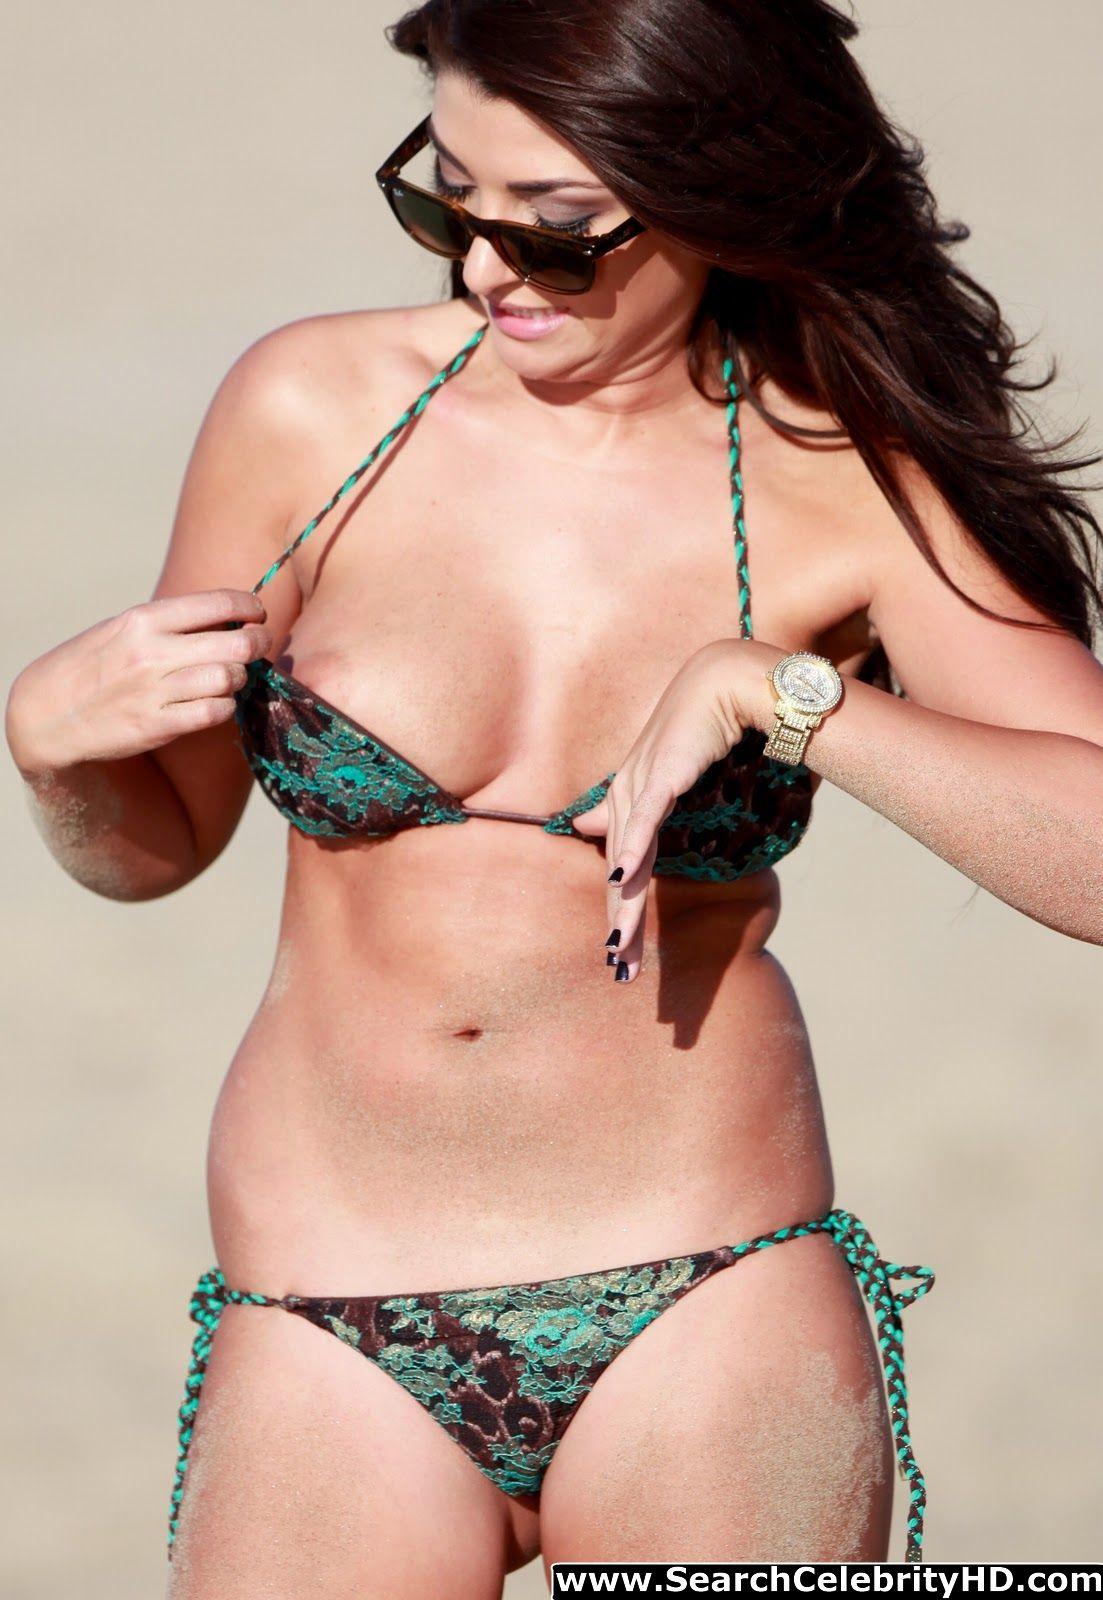 http://4.bp.blogspot.com/-7rG7ksNXKZw/UMyePszlnUI/AAAAAAAABkQ/GH6q6NlR2Dc/s1600/Brittney+Jones+Stated+Bikini+Candids+And+Revealing+Some+Nips-www.searchcelebrityhd.com-001+(17).jpg